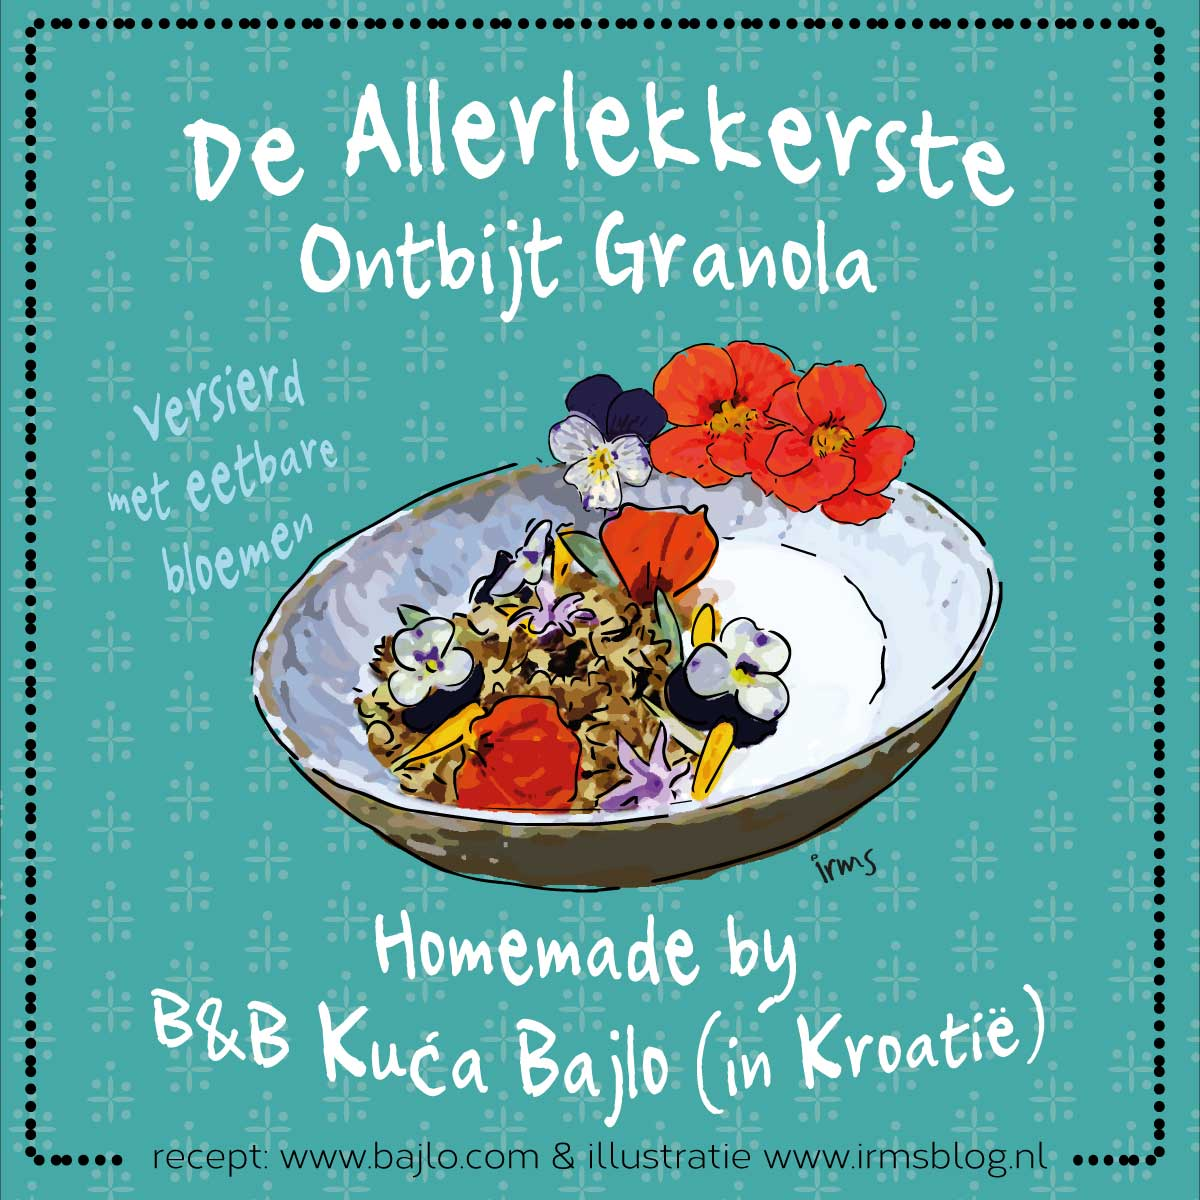 illustratie ontbijt granola B&B Kuca Bajlo van irmsblog